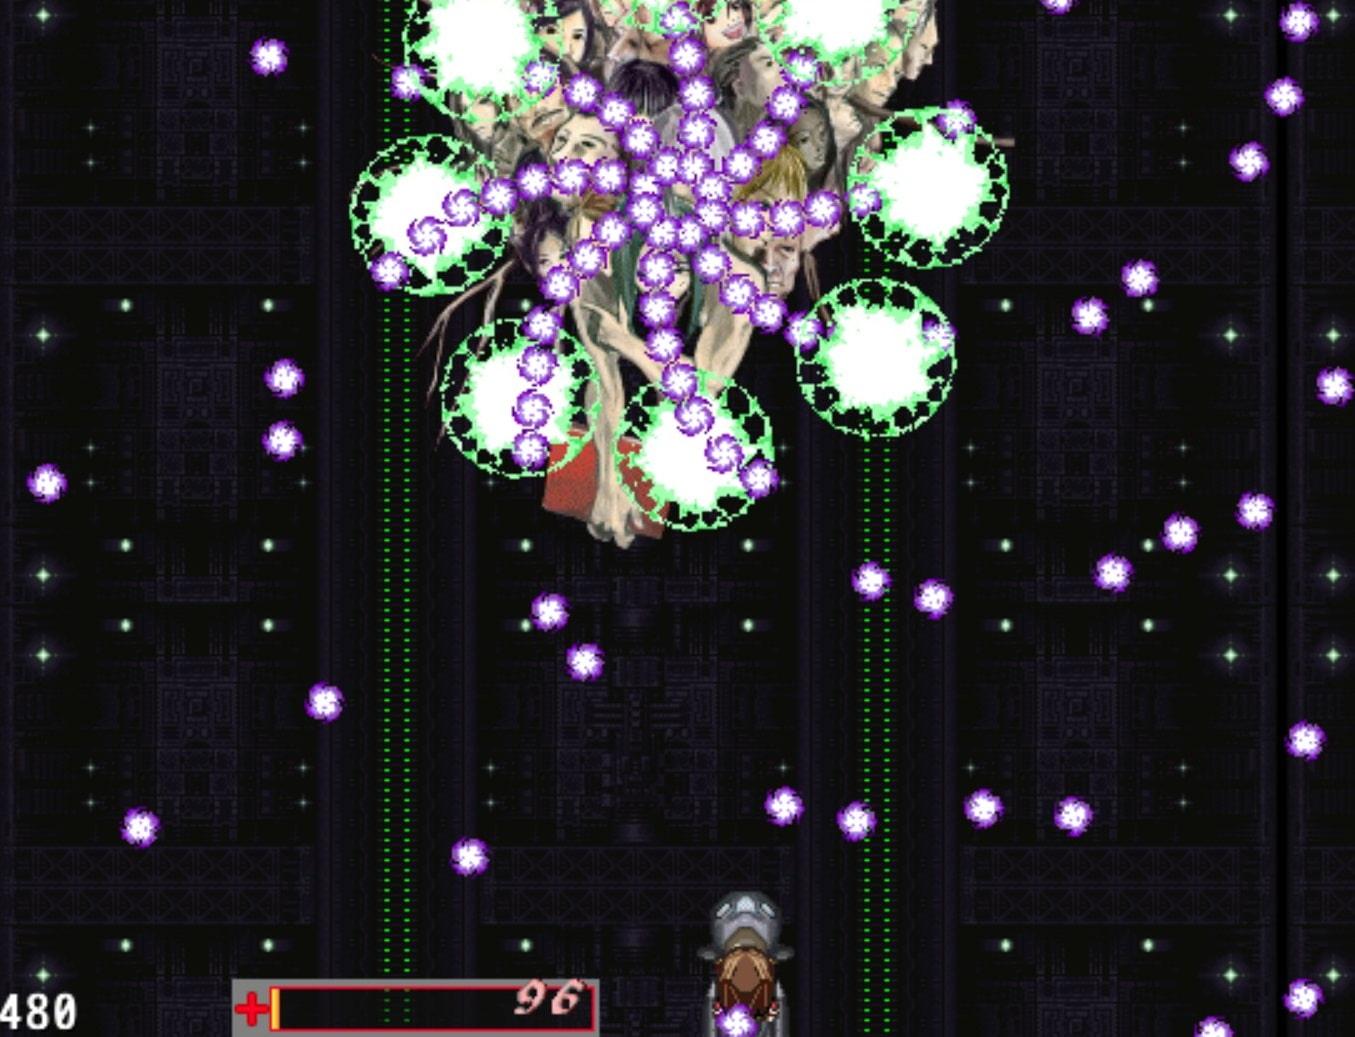 Master of Valkyrian (esaka回廊) DLsite提供:同人ゲーム – シューティング